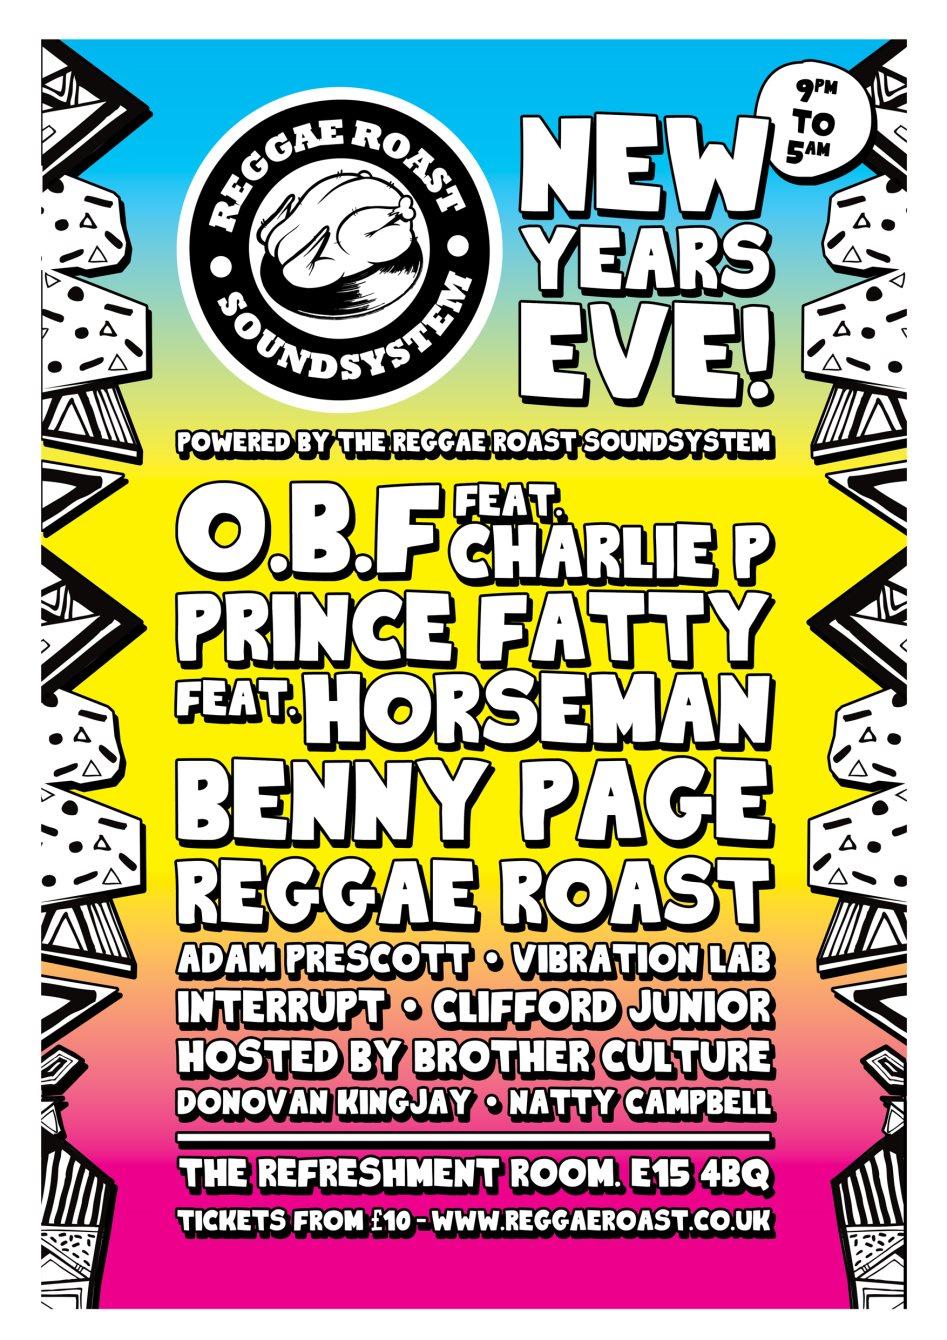 Reggae Roast Soundsystem NYE 2018 - Flyer front